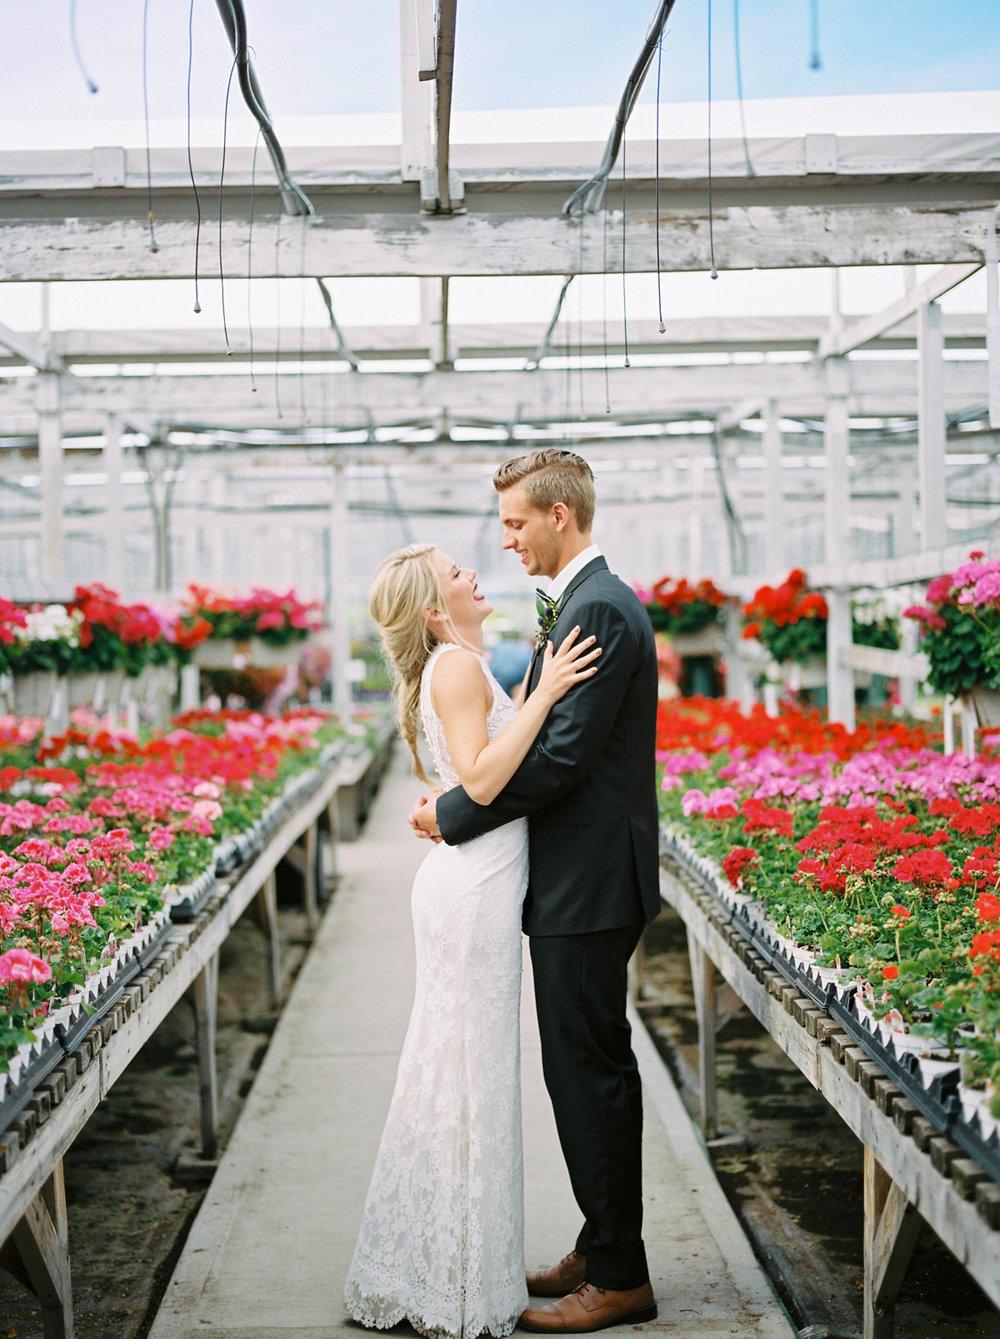 ivyandrosephoto-kelowna-wedding-167.jpg